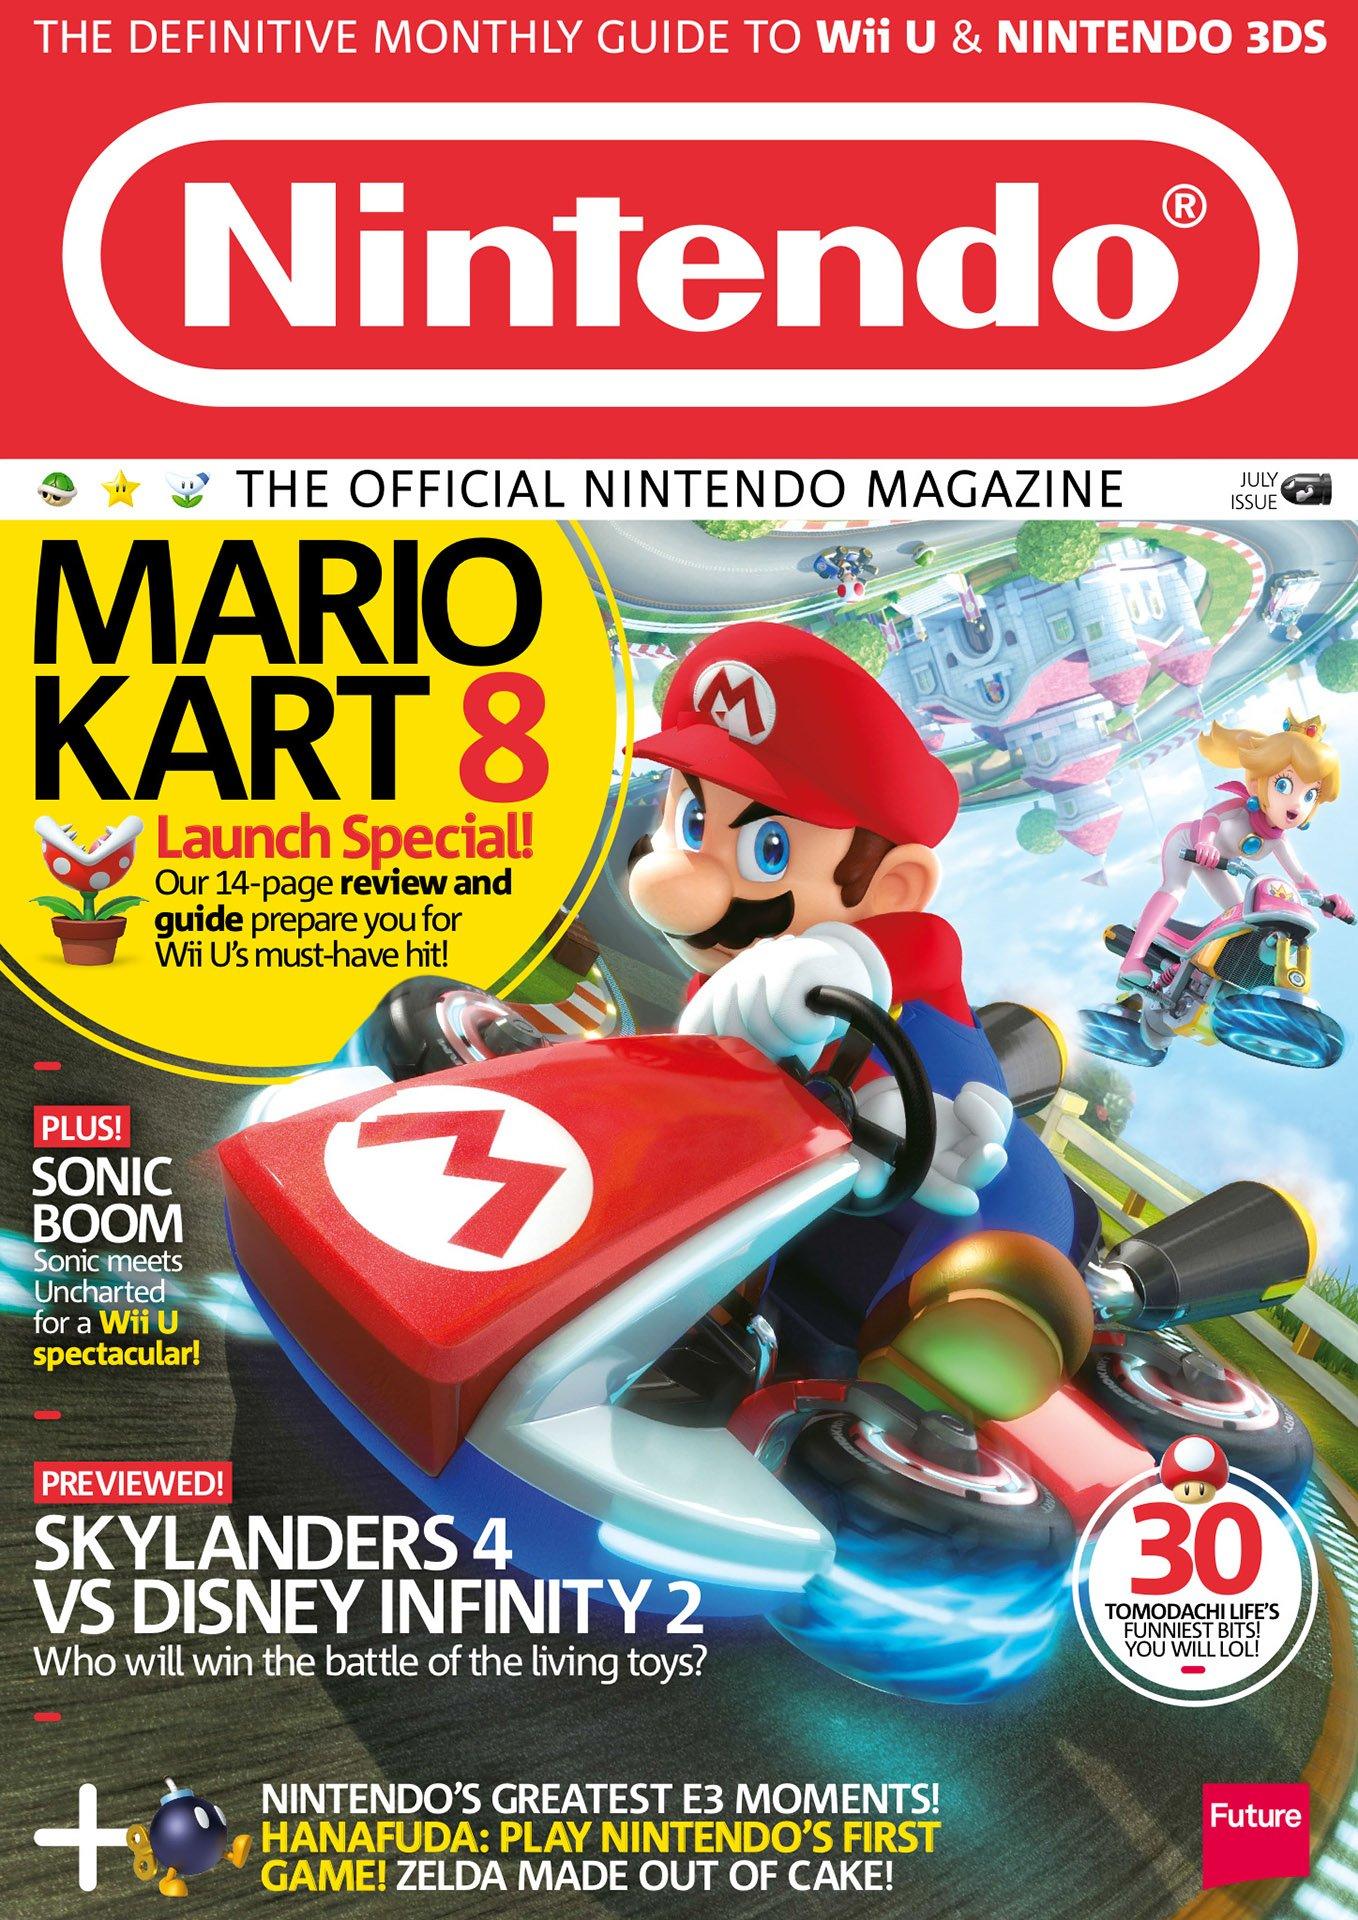 Official Nintendo Magazine 109 (July 2014)